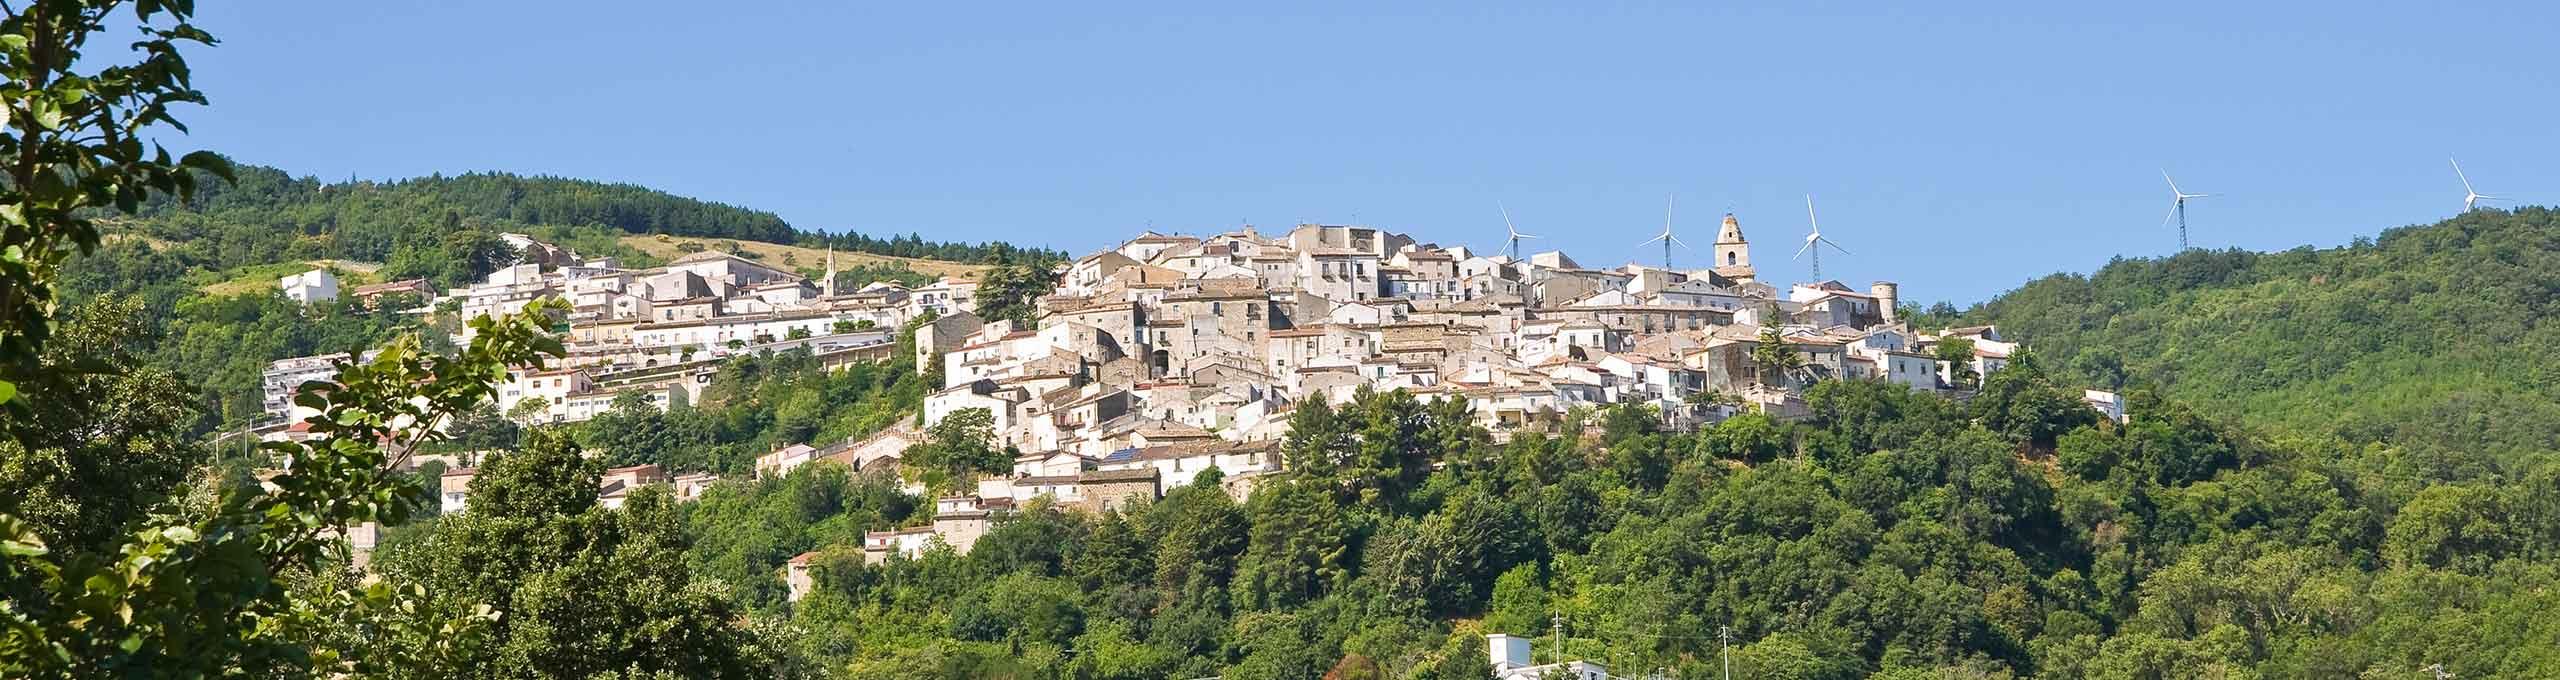 Alberona, Monti Dauni, Puglia